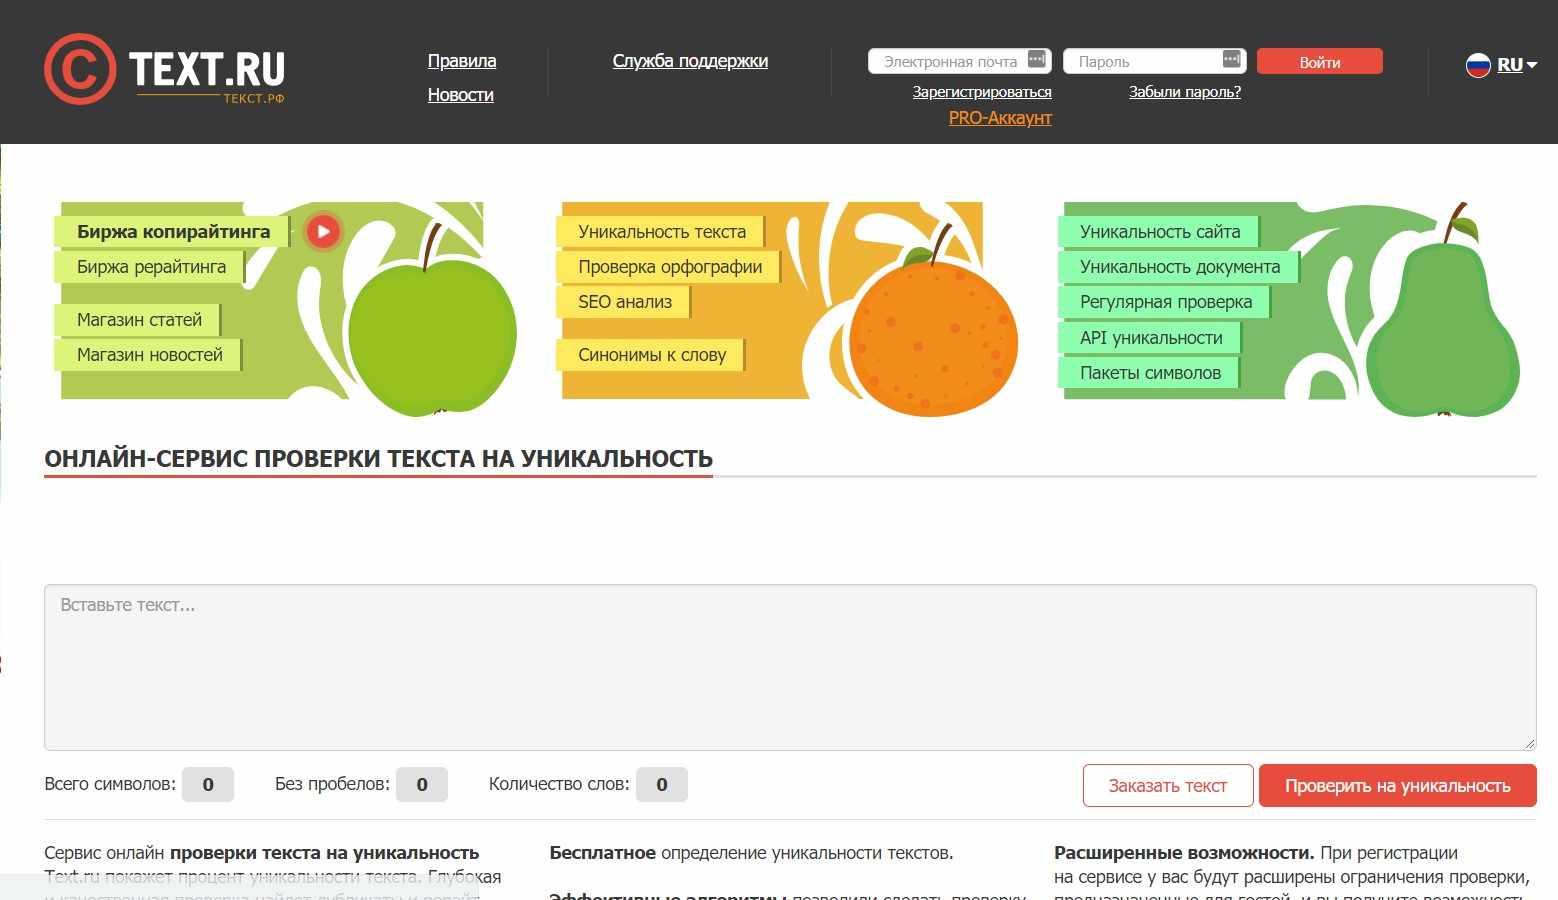 проверка на антиплагиат text.ru